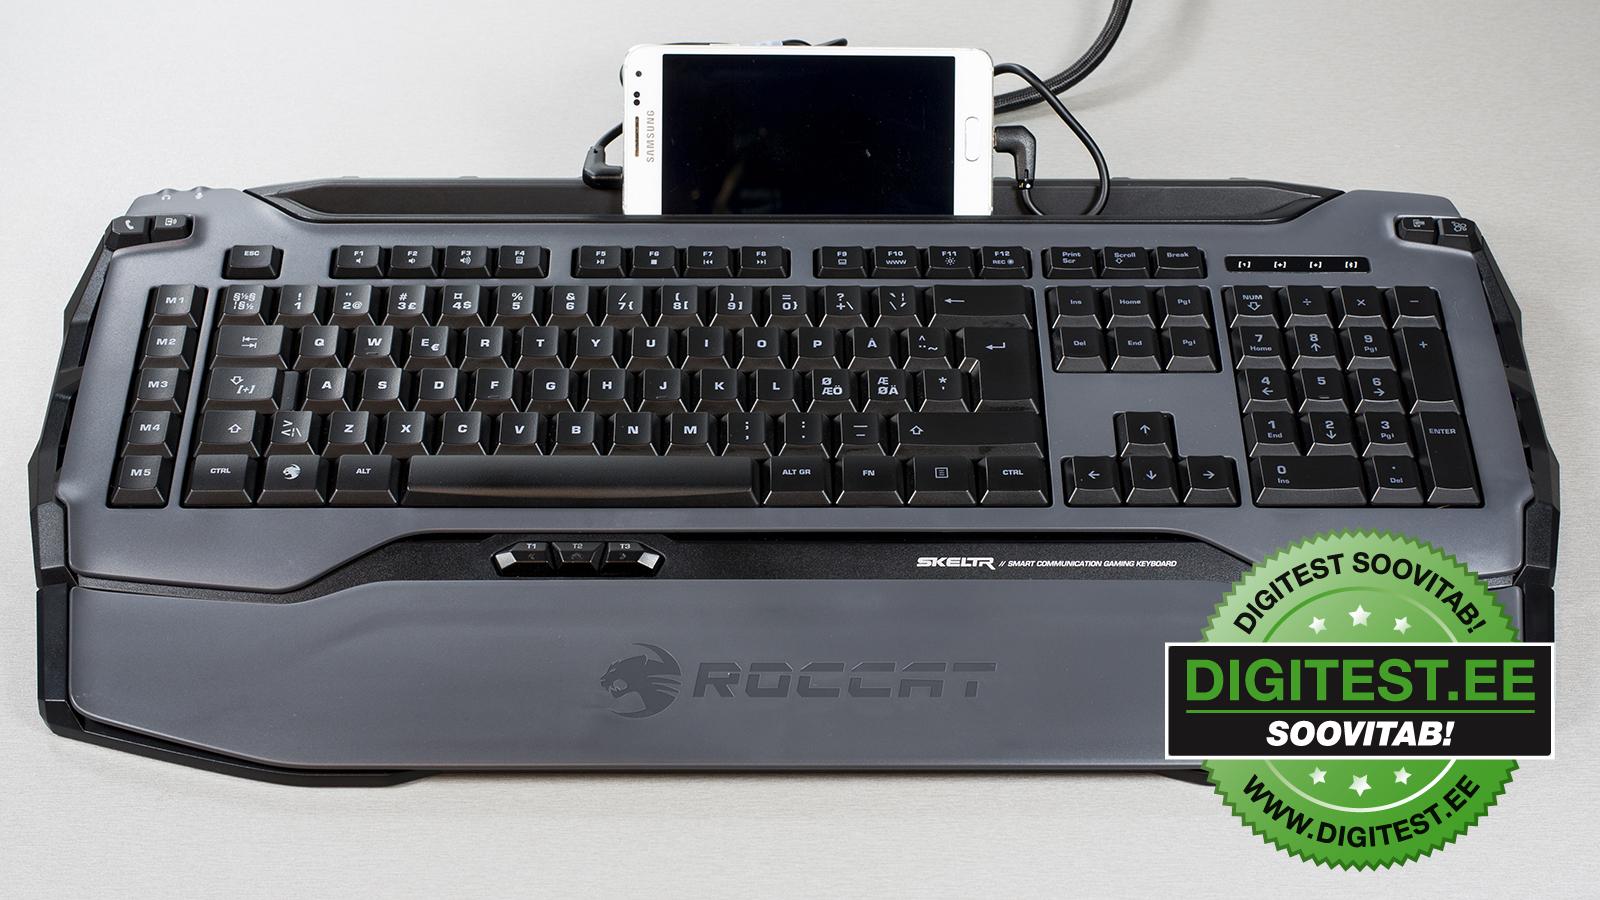 roccat-skeltr-015-kokkuvote